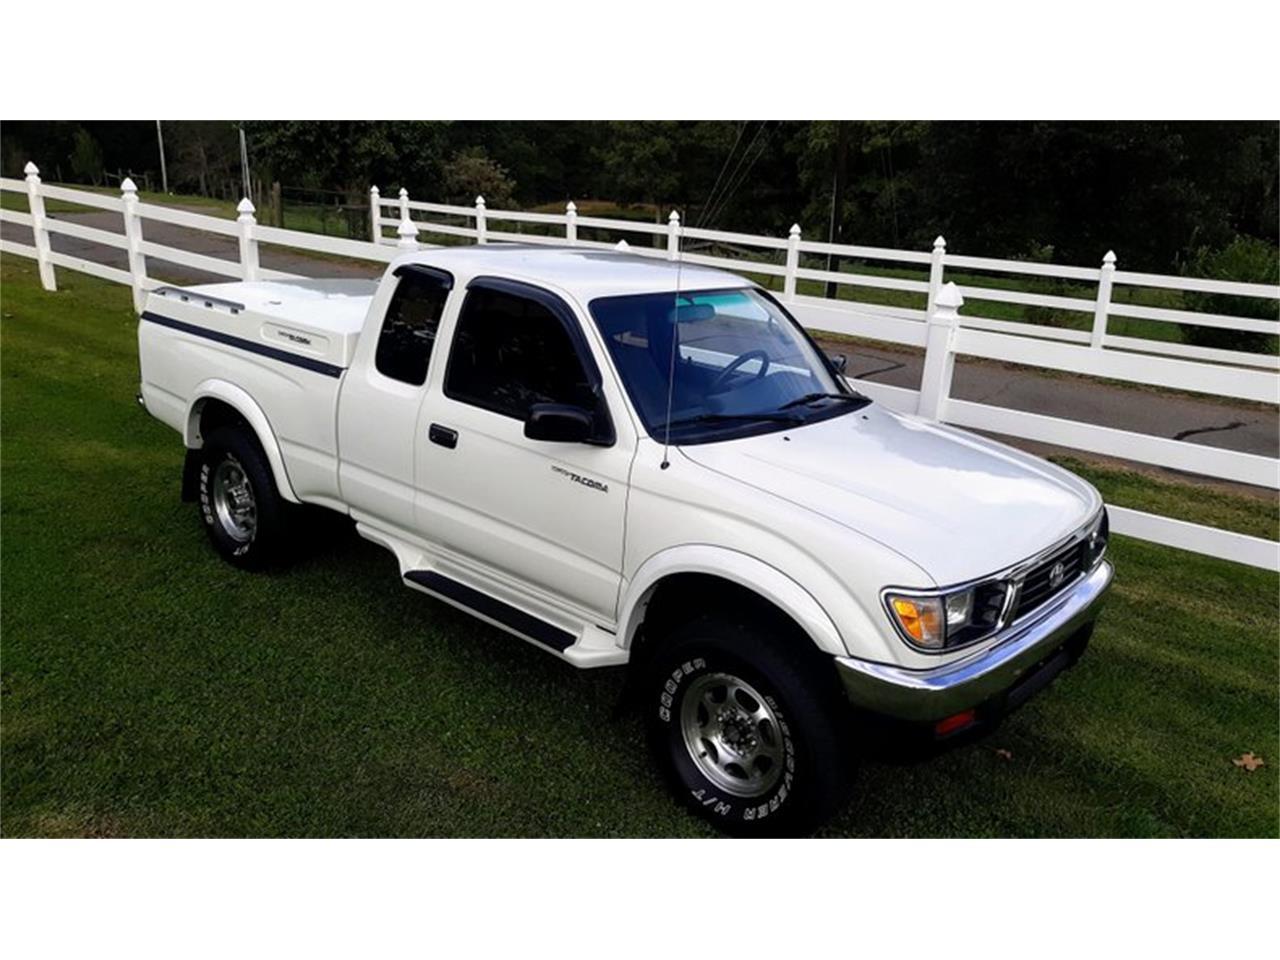 1997 Toyota Tacoma (CC-1393861) for sale in Greensboro, North Carolina